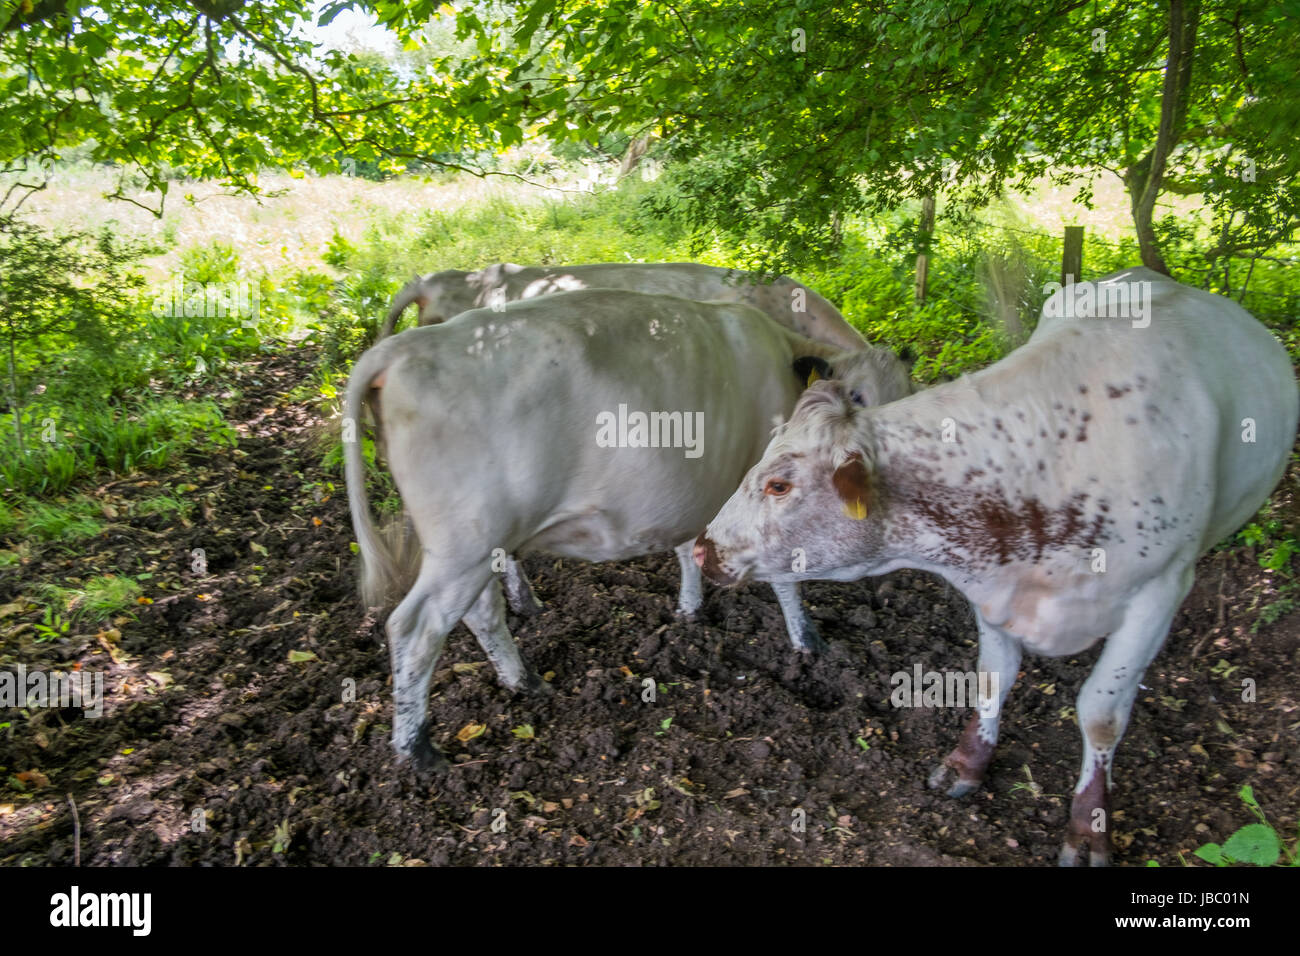 Cattle in field - Stock Image